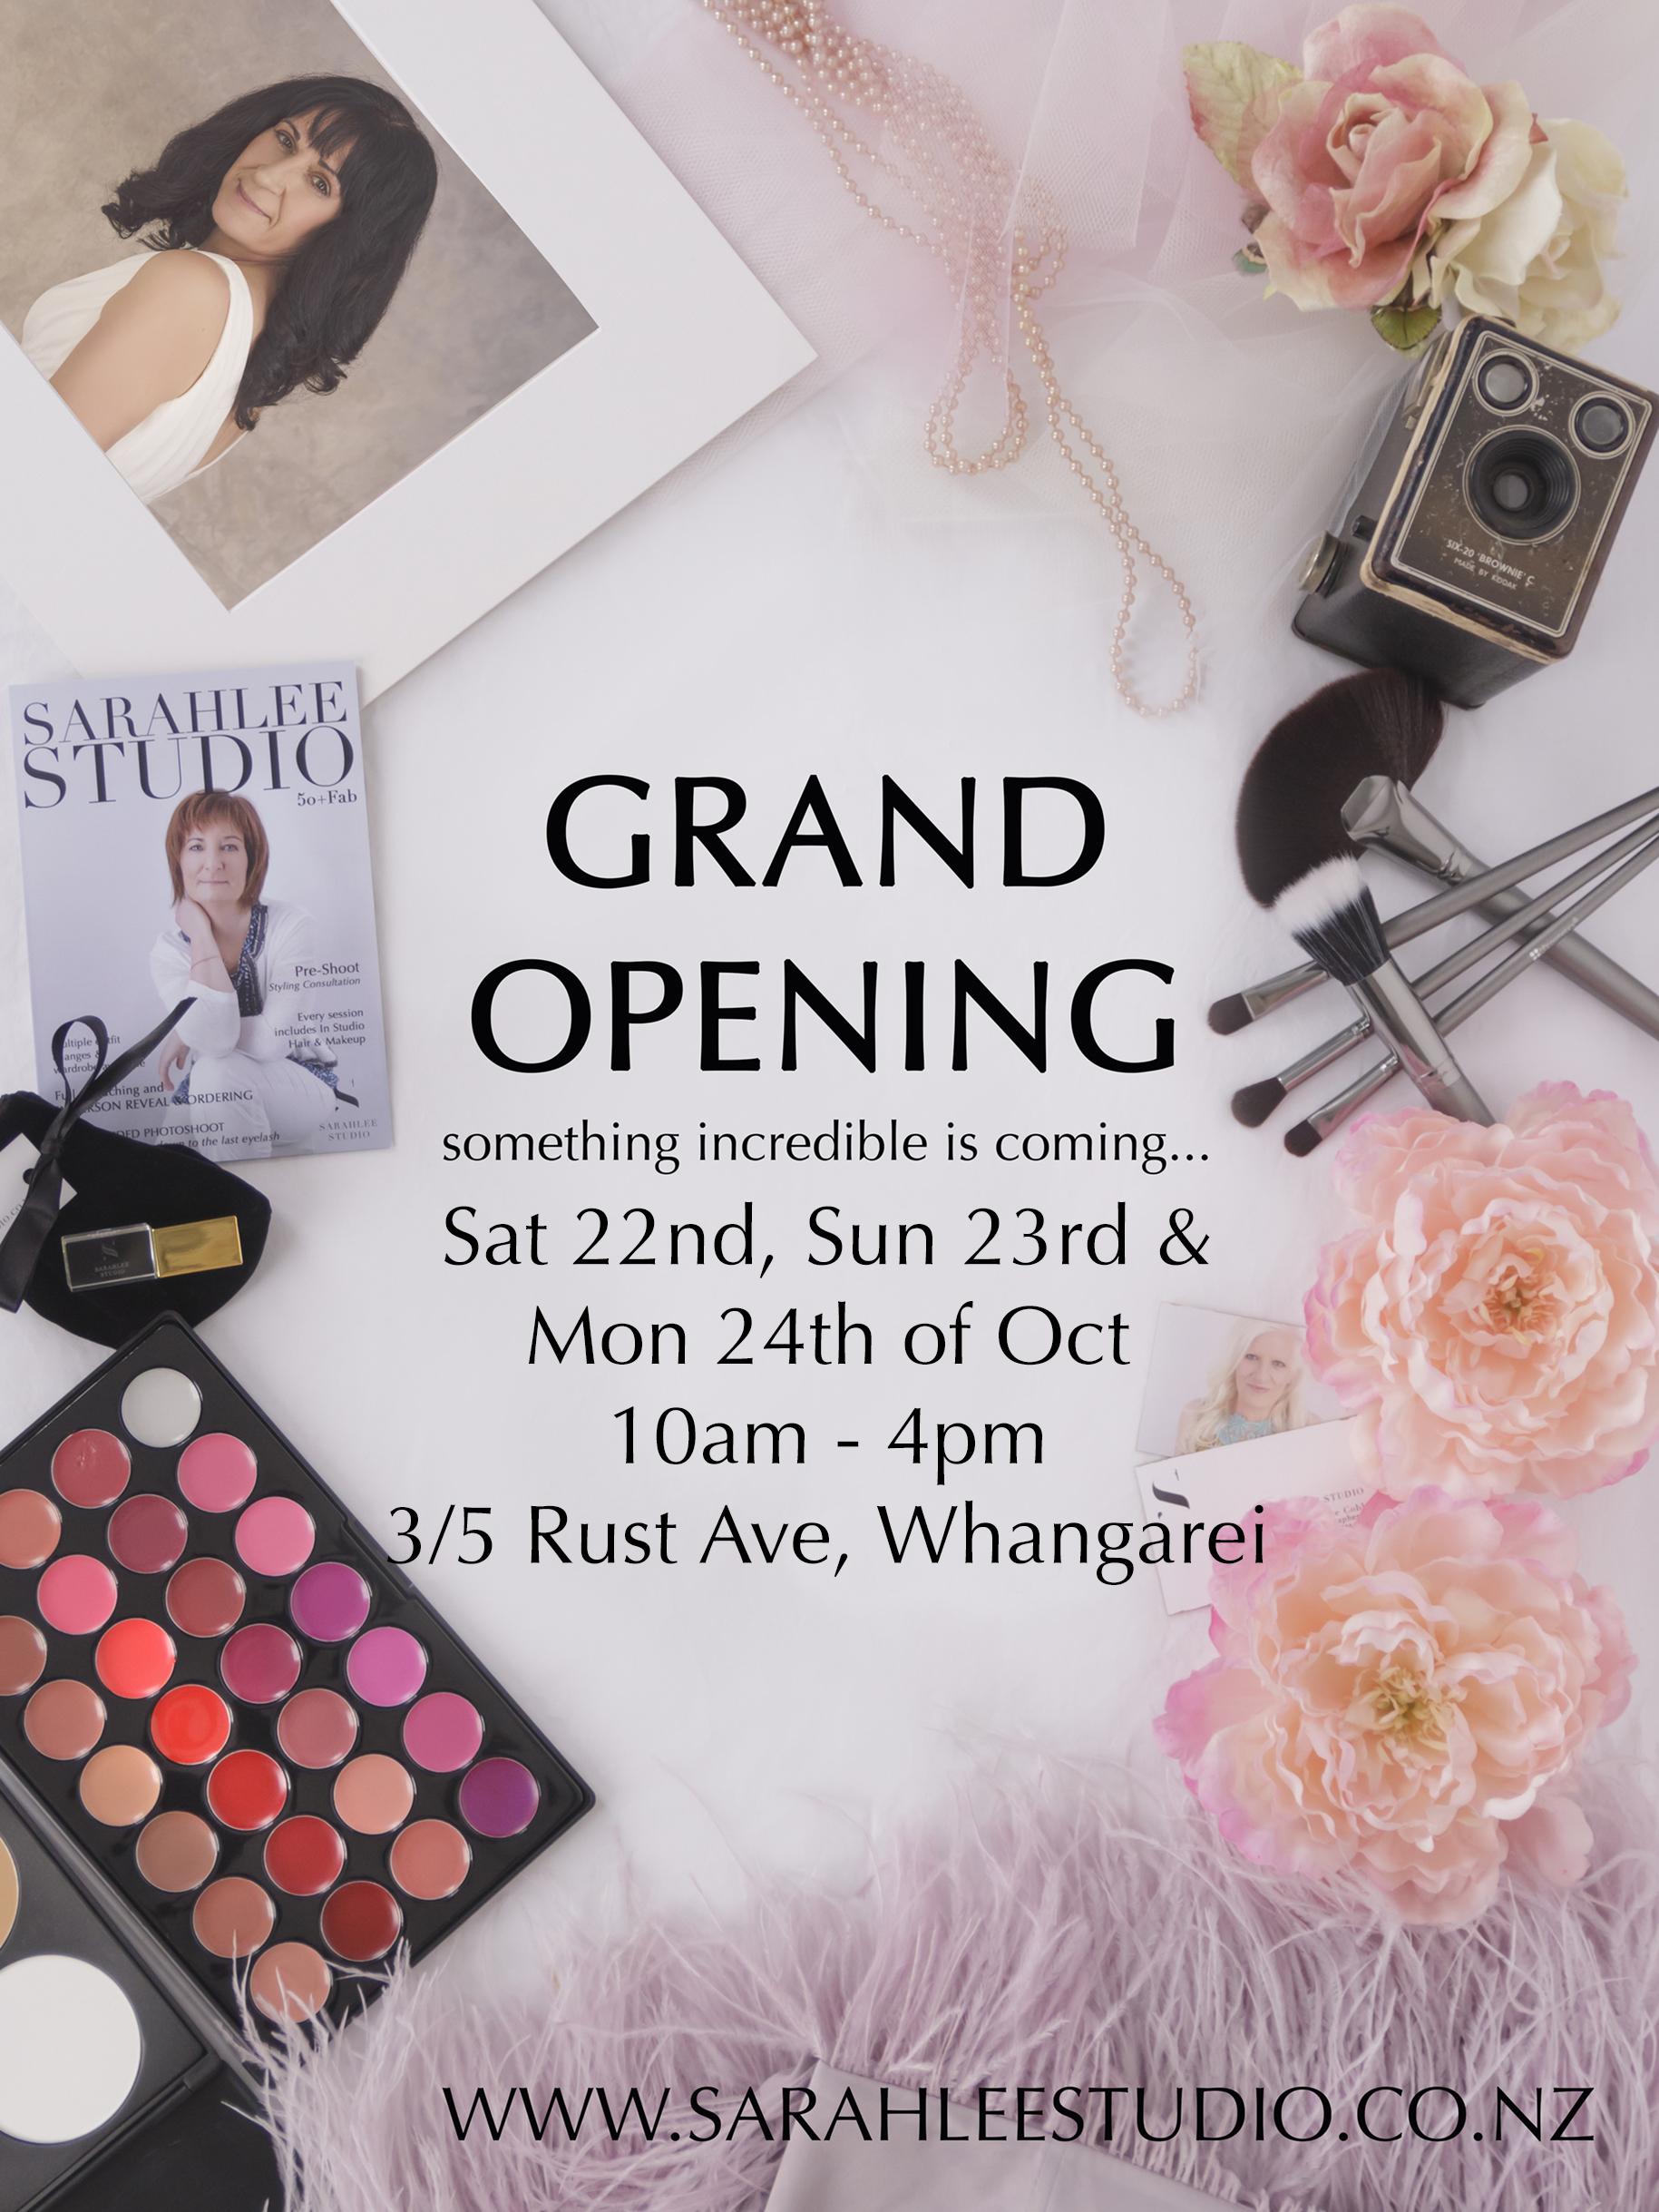 sarahlee-studio-opening-whangarei